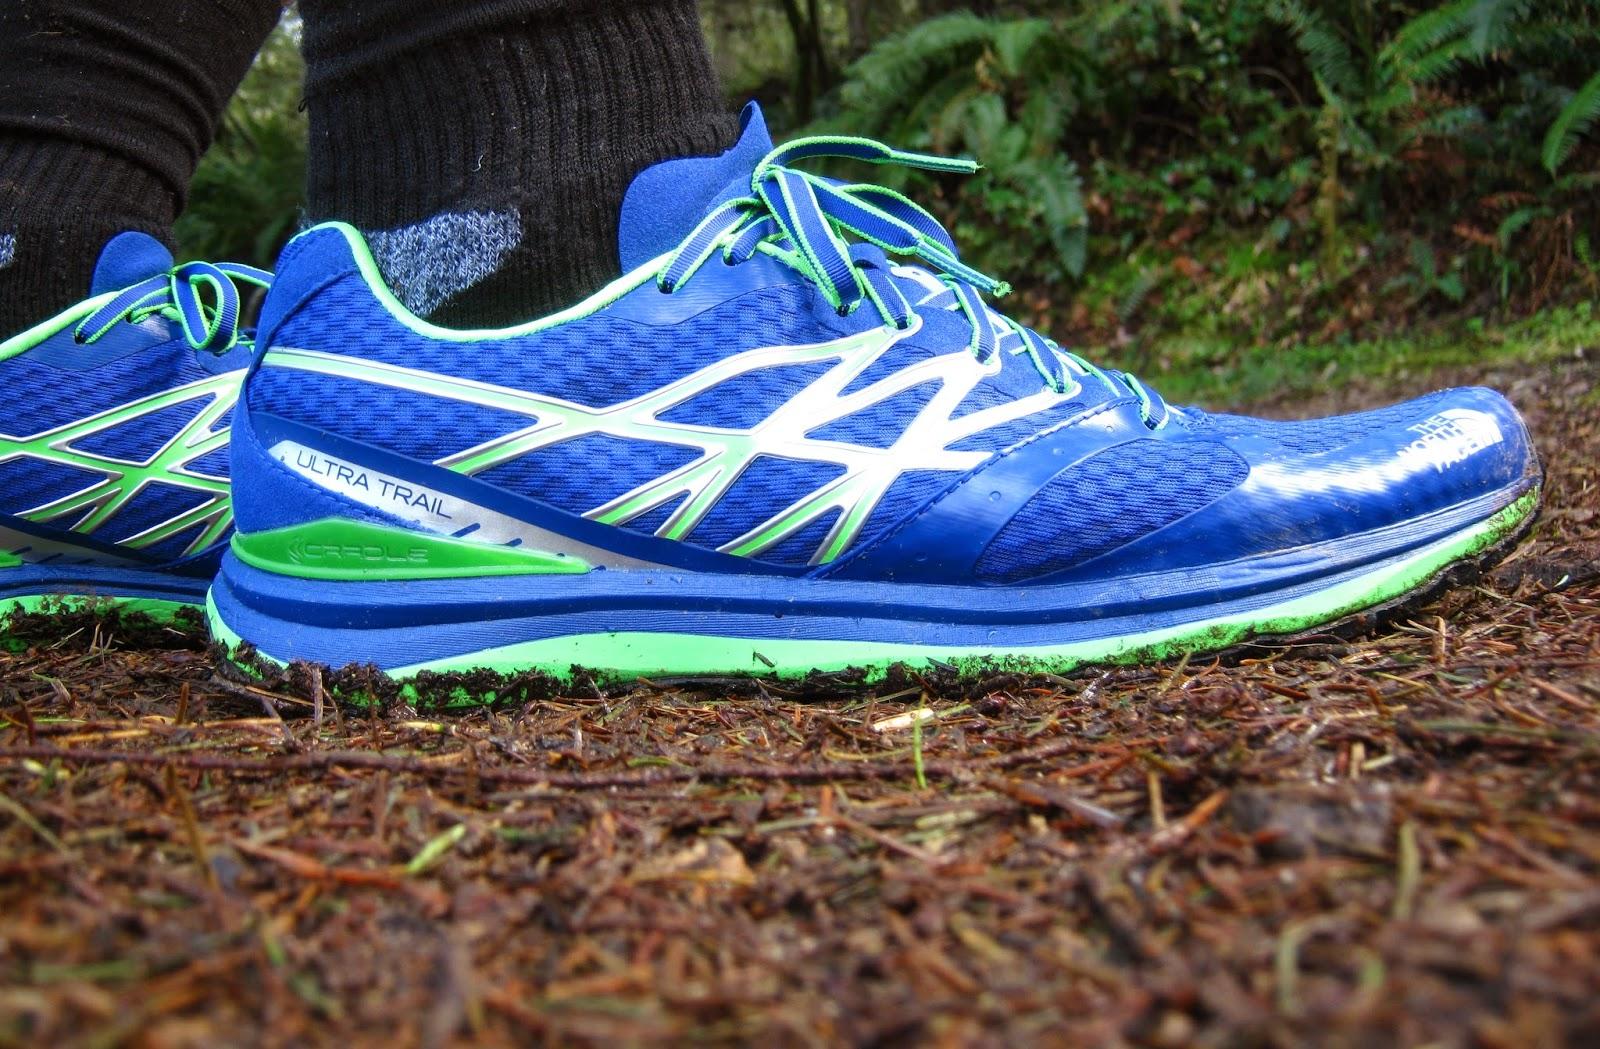 Zapatillas de ultra trail